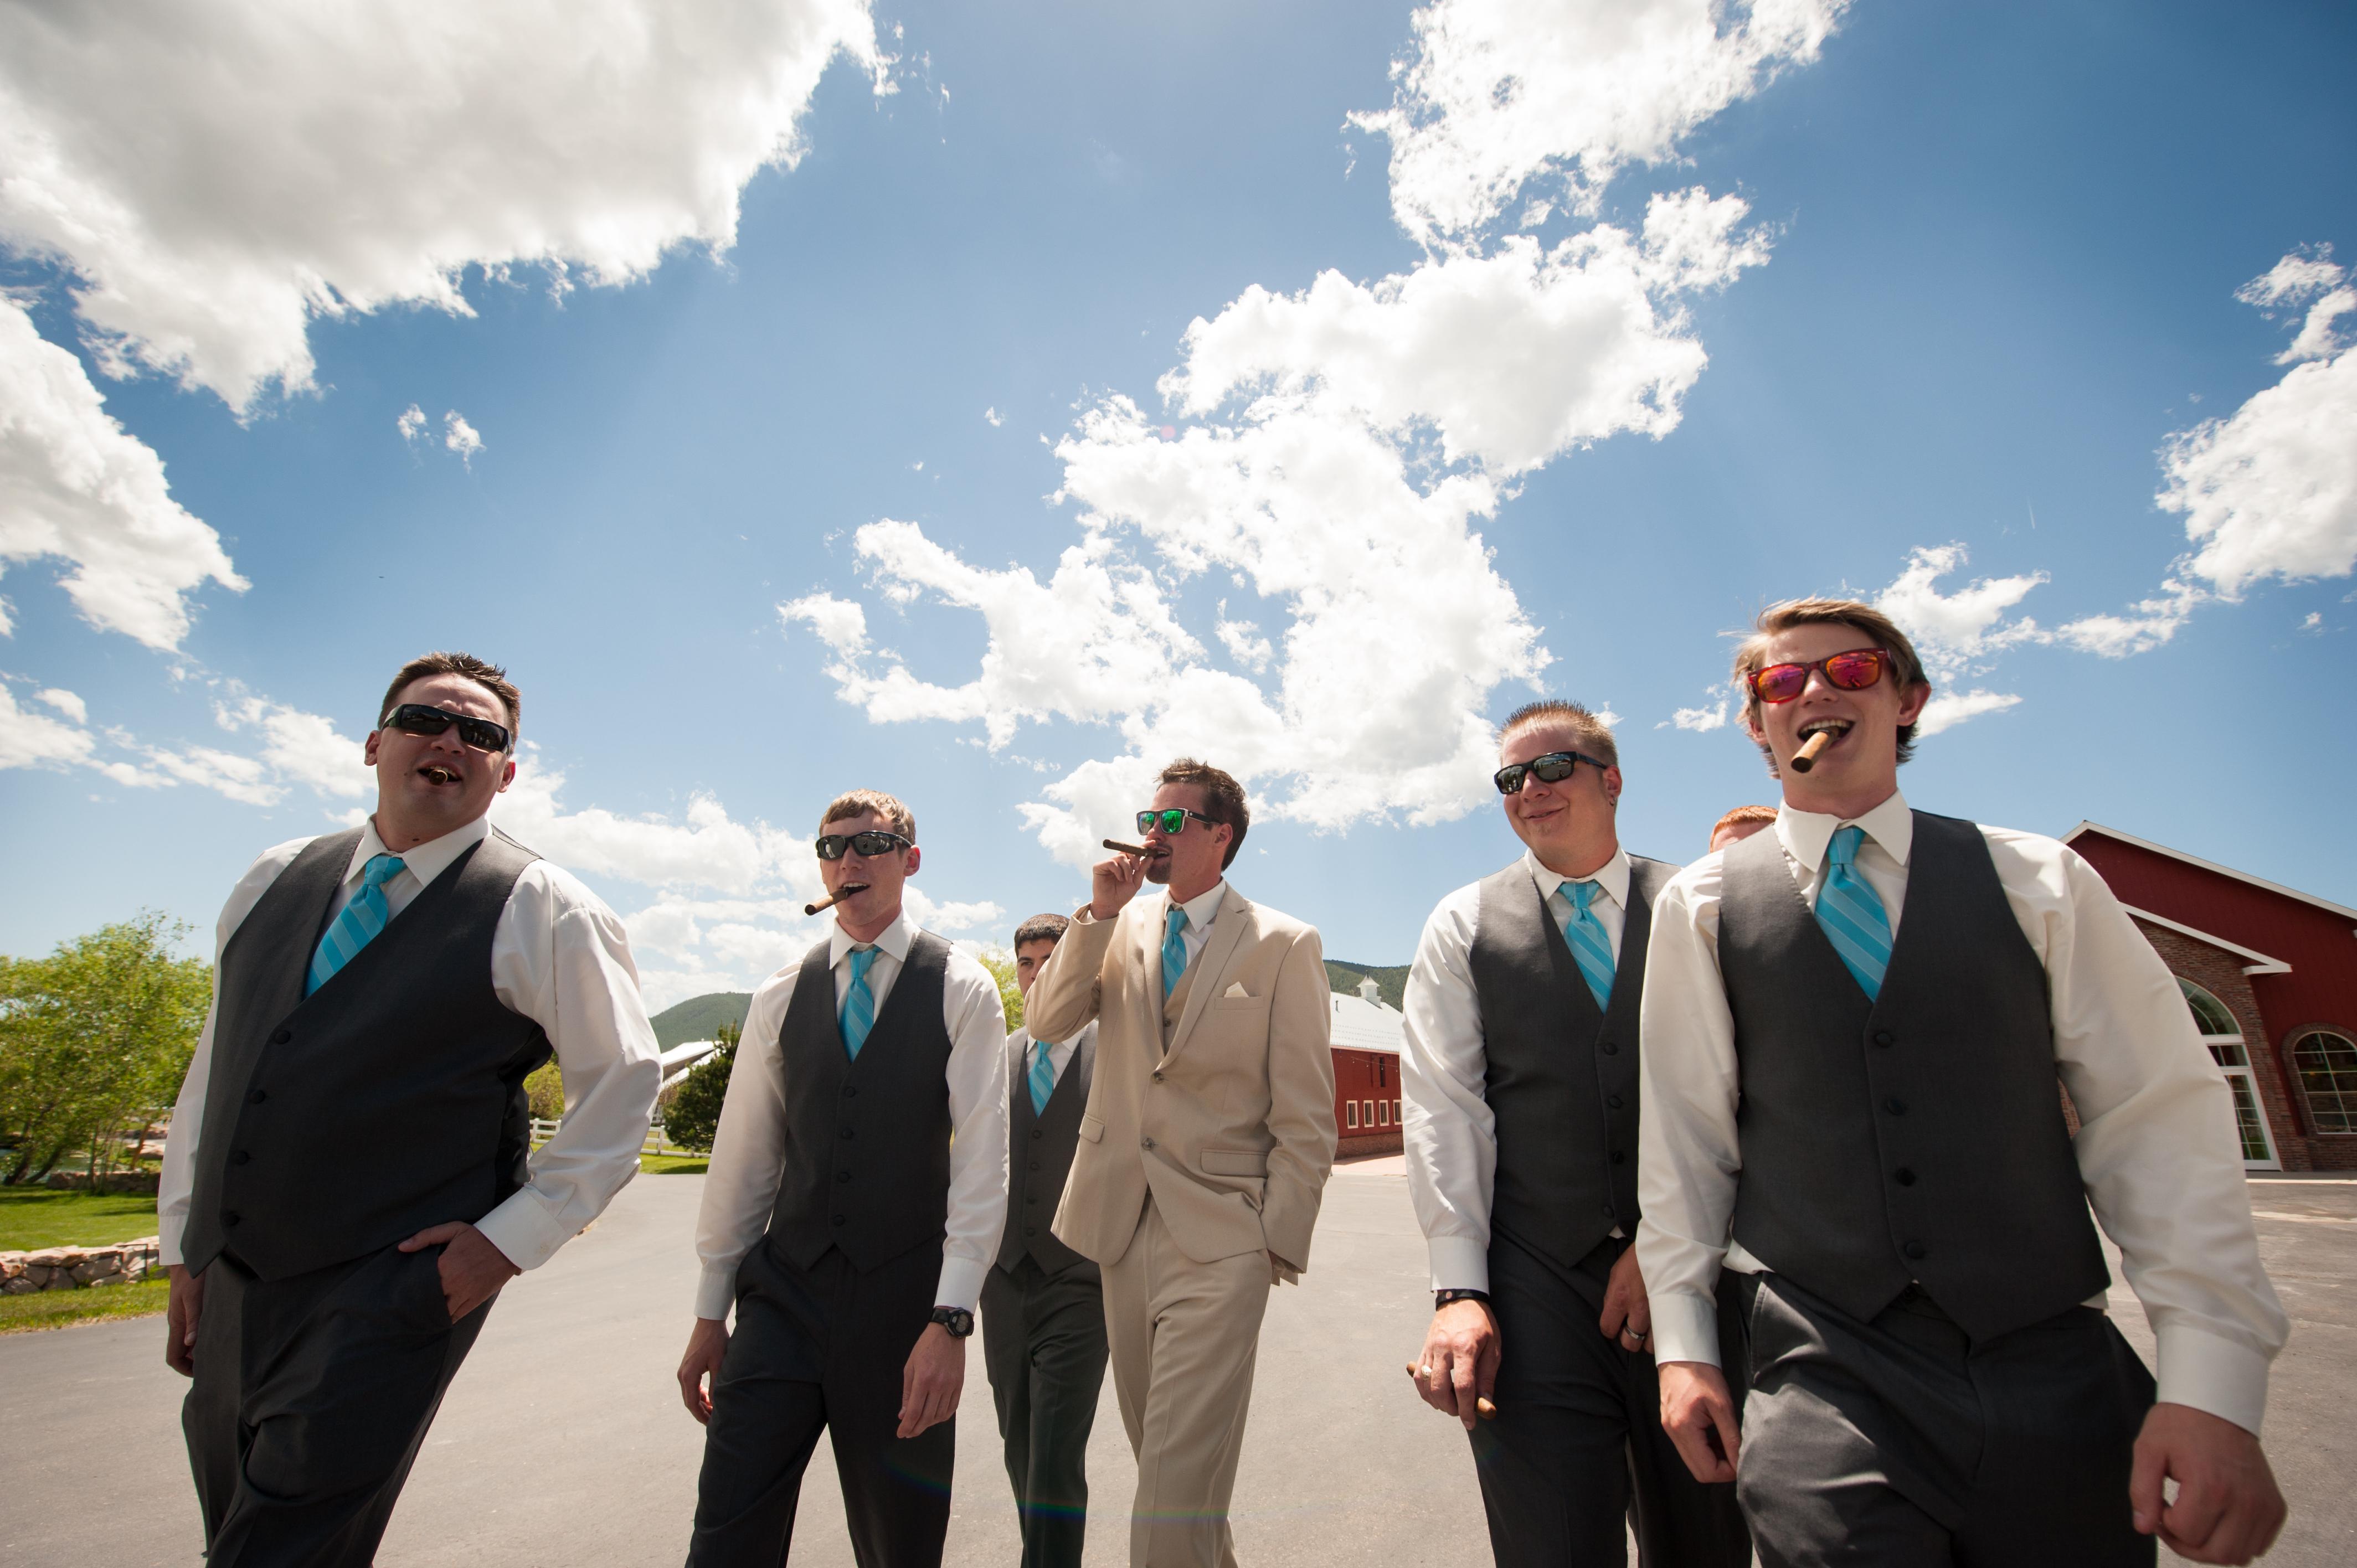 twin cities wedding photographer minnesota wedding photgrapher east oaks photography wedding  (7)